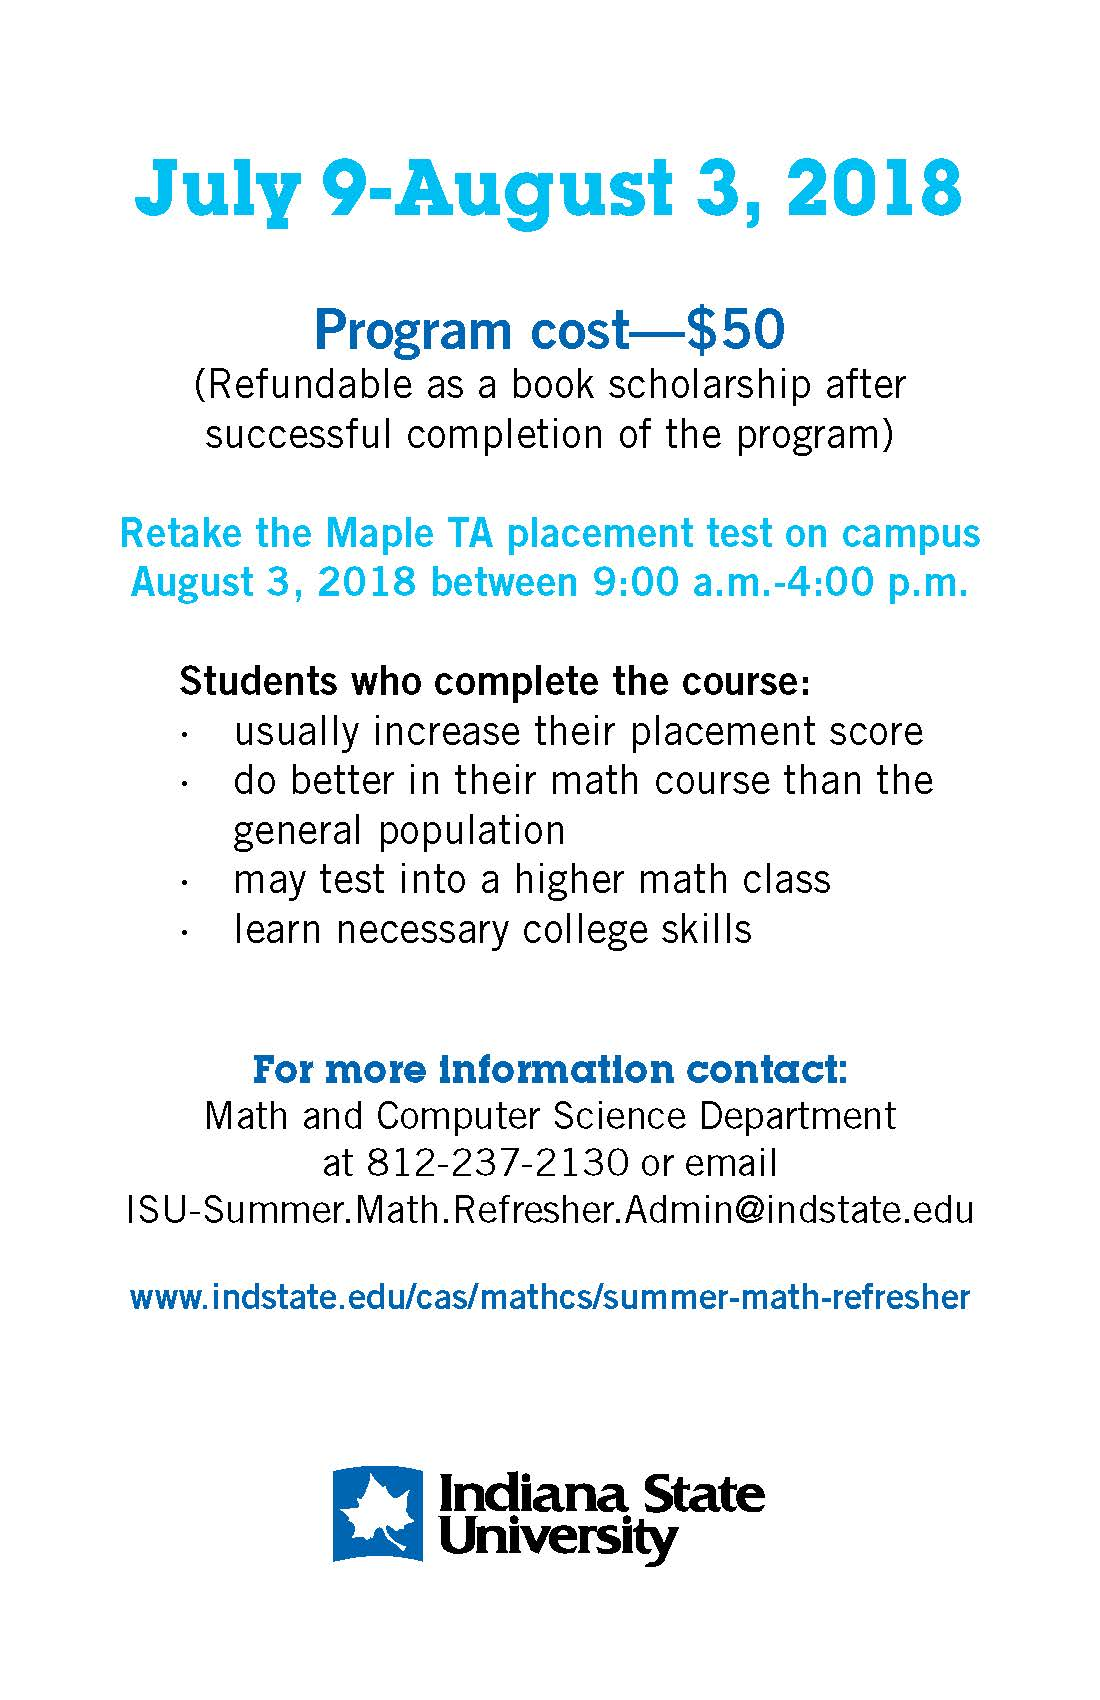 Summer Math Refresher 2